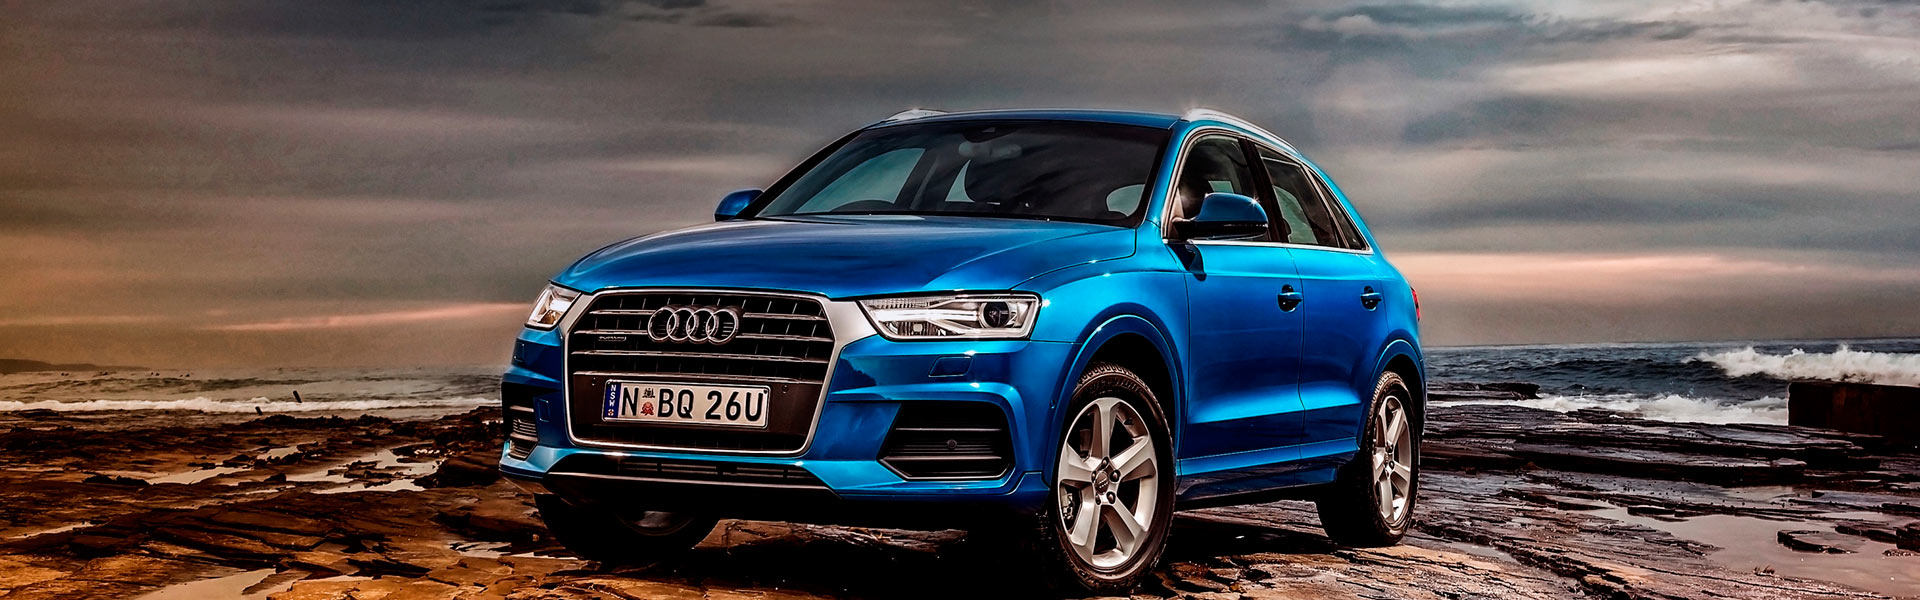 Замена втулок Audi